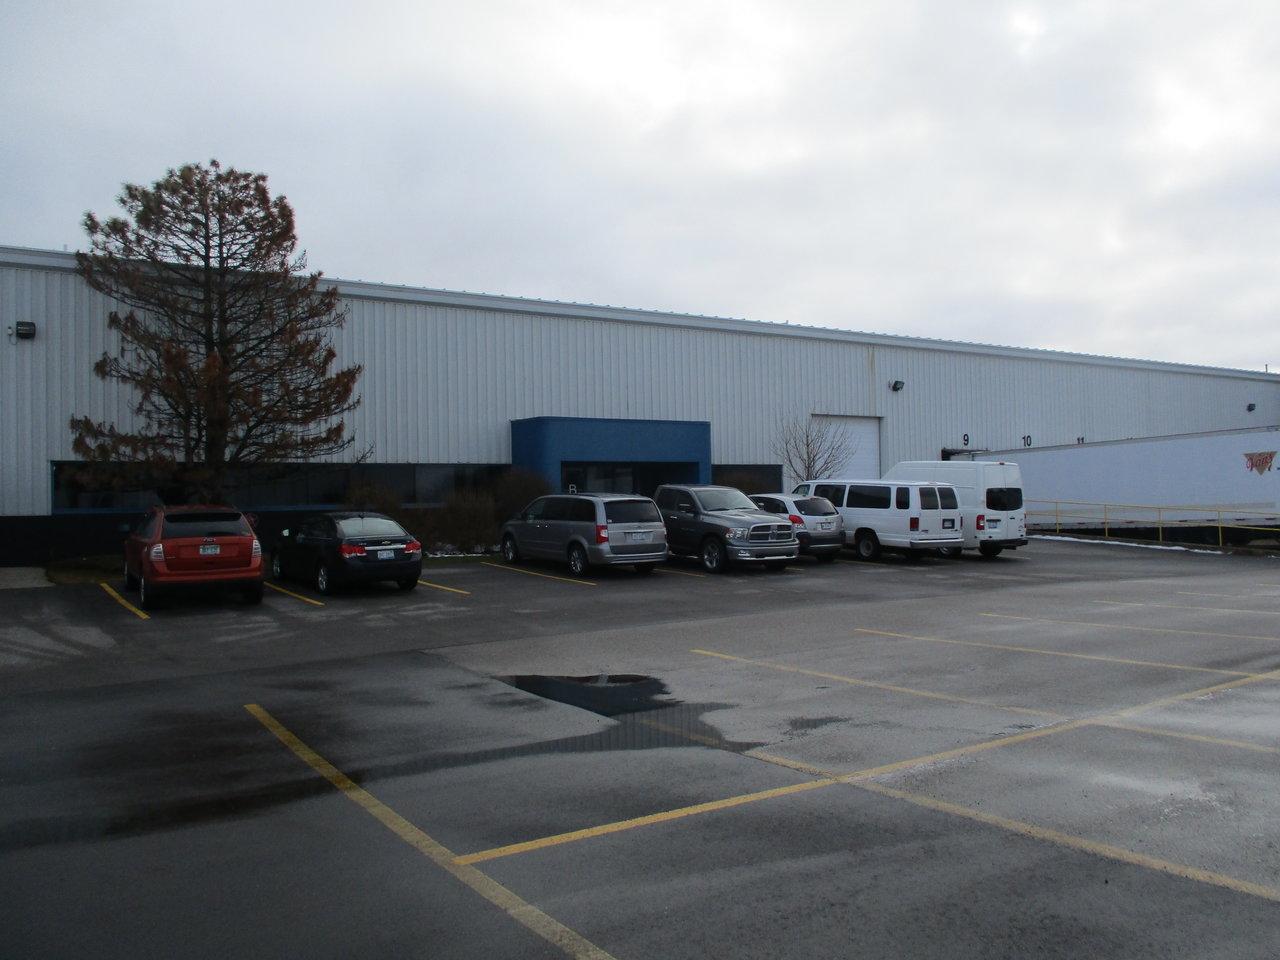 8191 Logistic Dr, Zeeland, MI, 49464